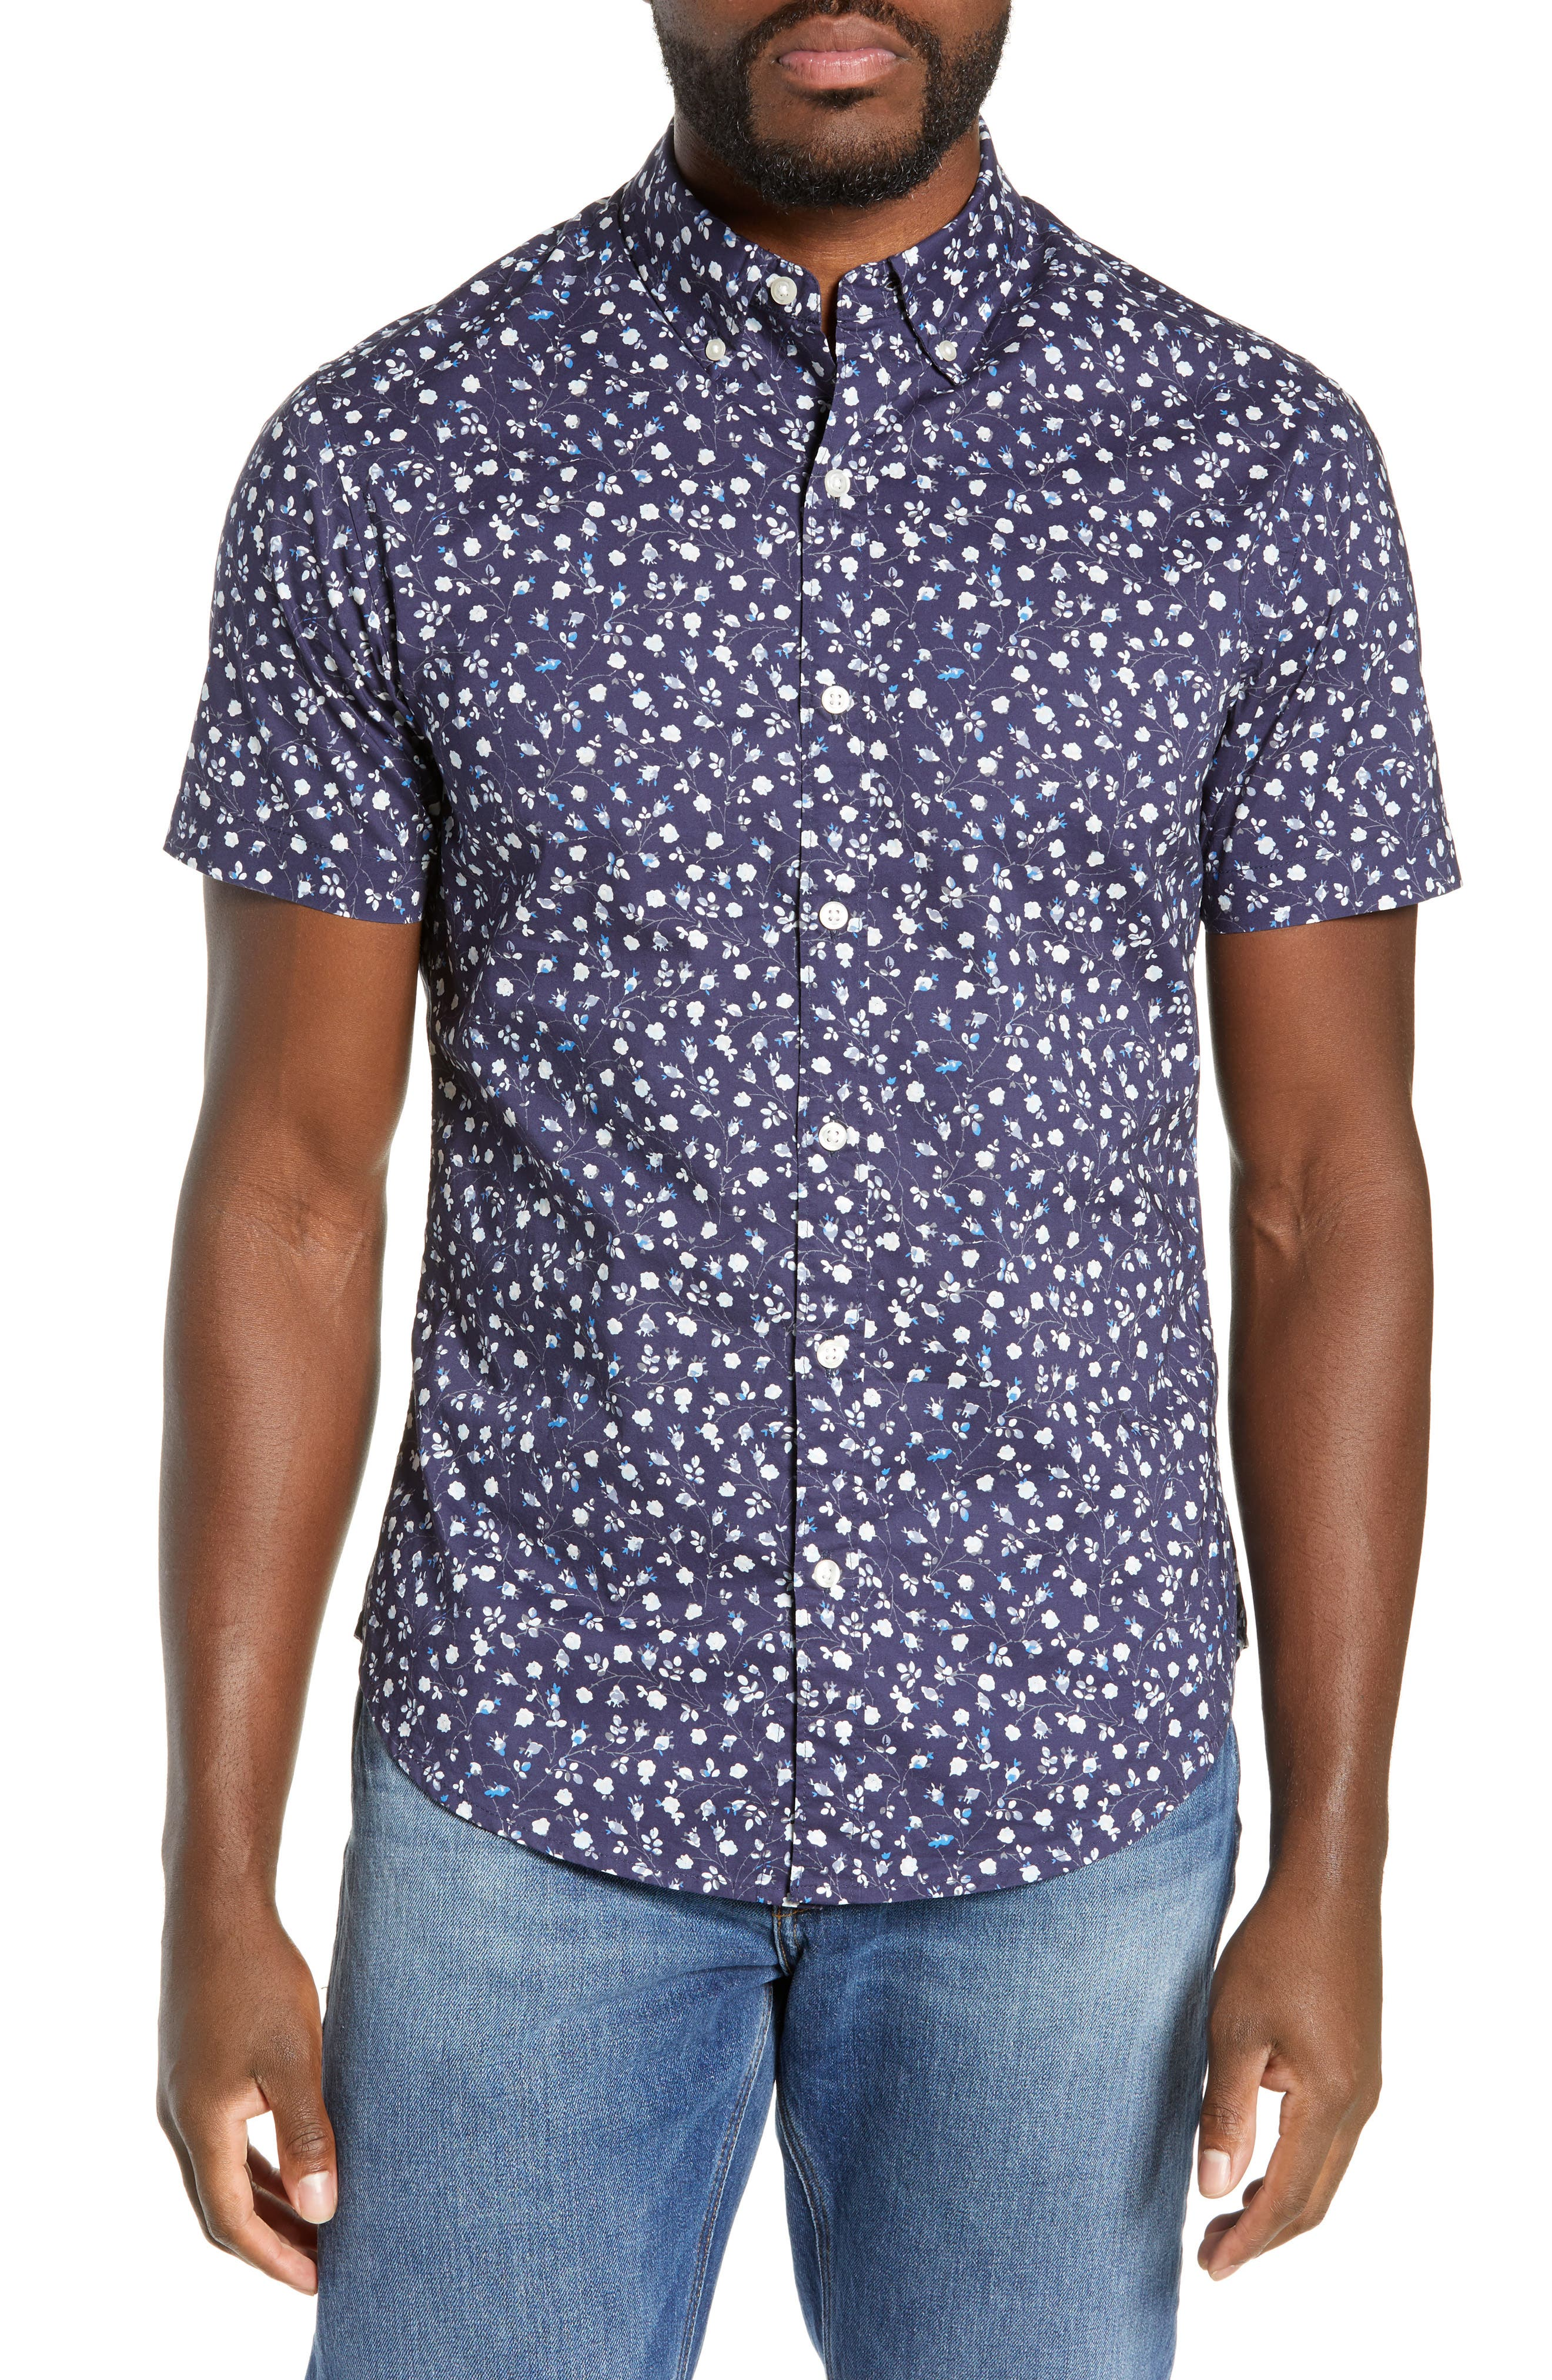 BONOBOS, Riviera Slim Fit Floral Print Sport Shirt, Main thumbnail 1, color, BLUE FLORAL